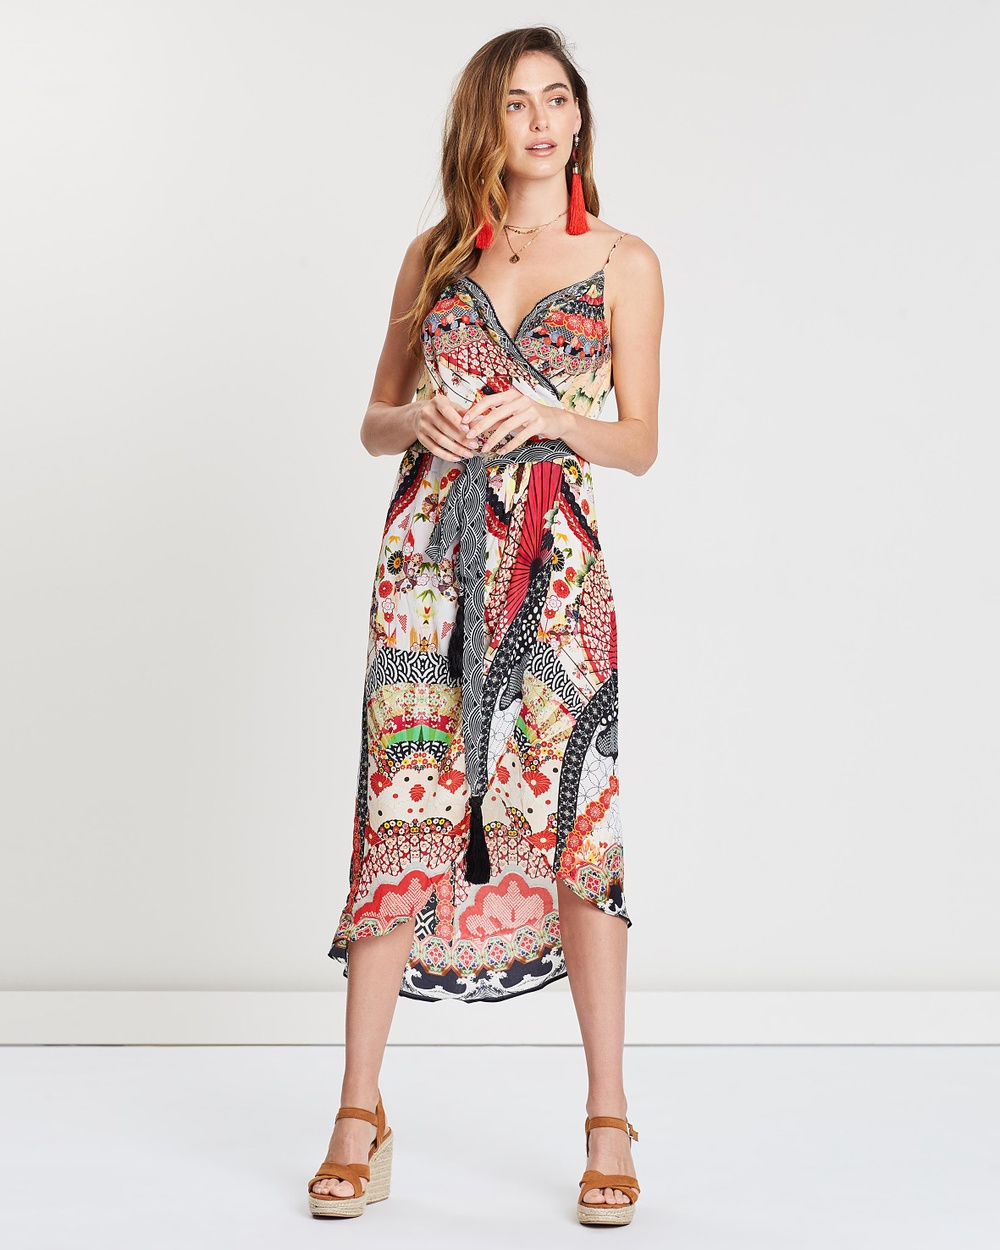 Camilla Vintage Vixen Asymmetric Wrap Dress